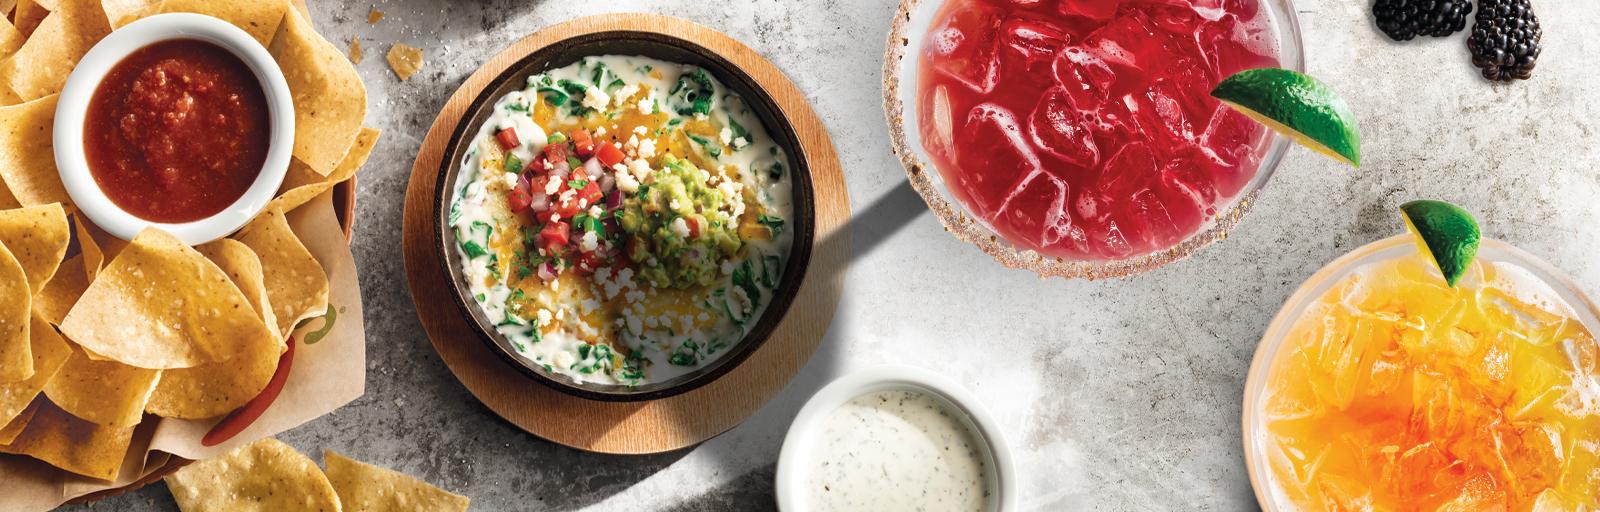 Happy Hour Restaurant Drink Specials & Food Deals   Chili's